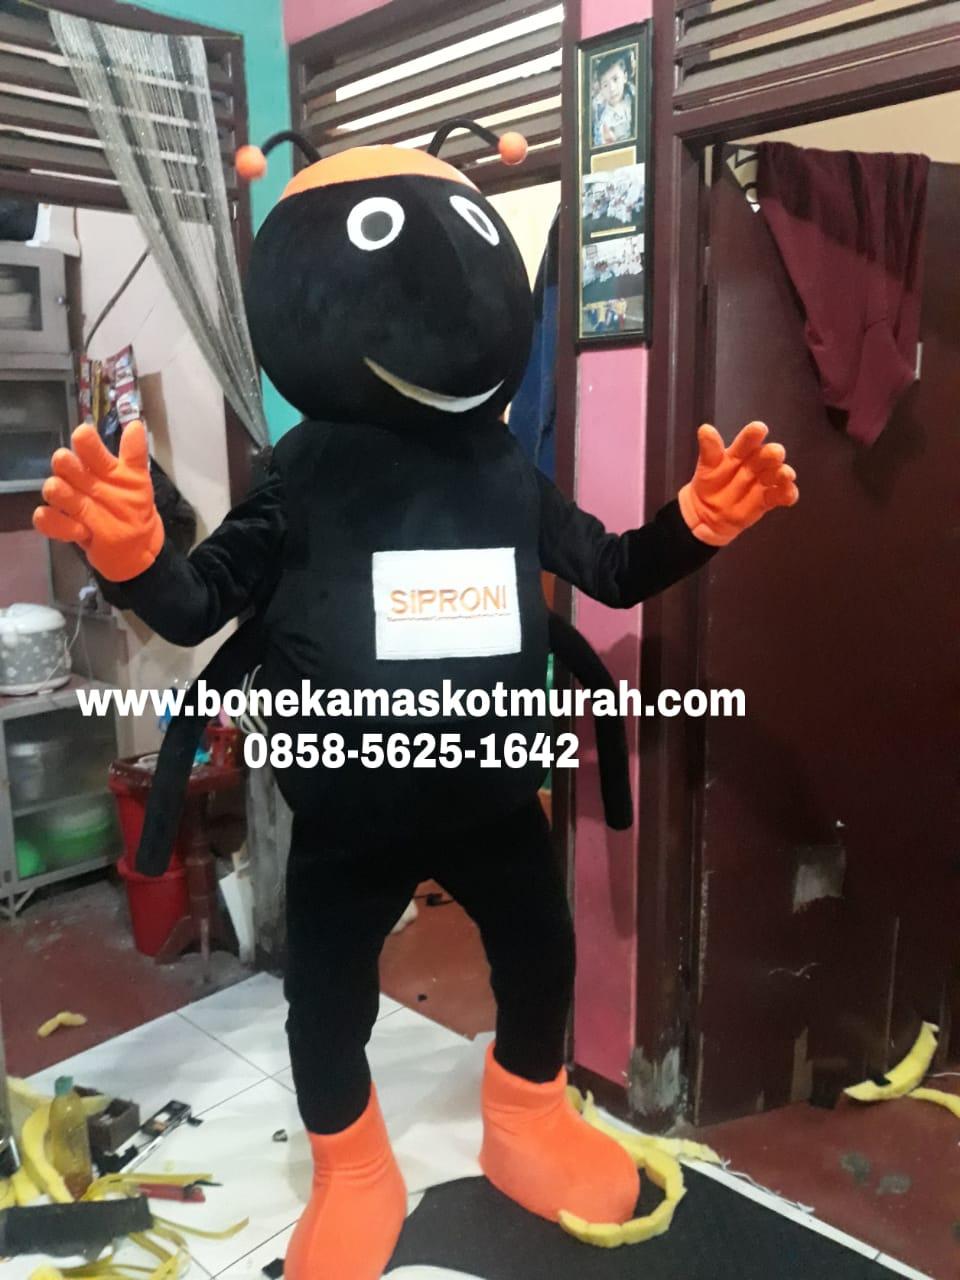 kostum maskot badut siproni